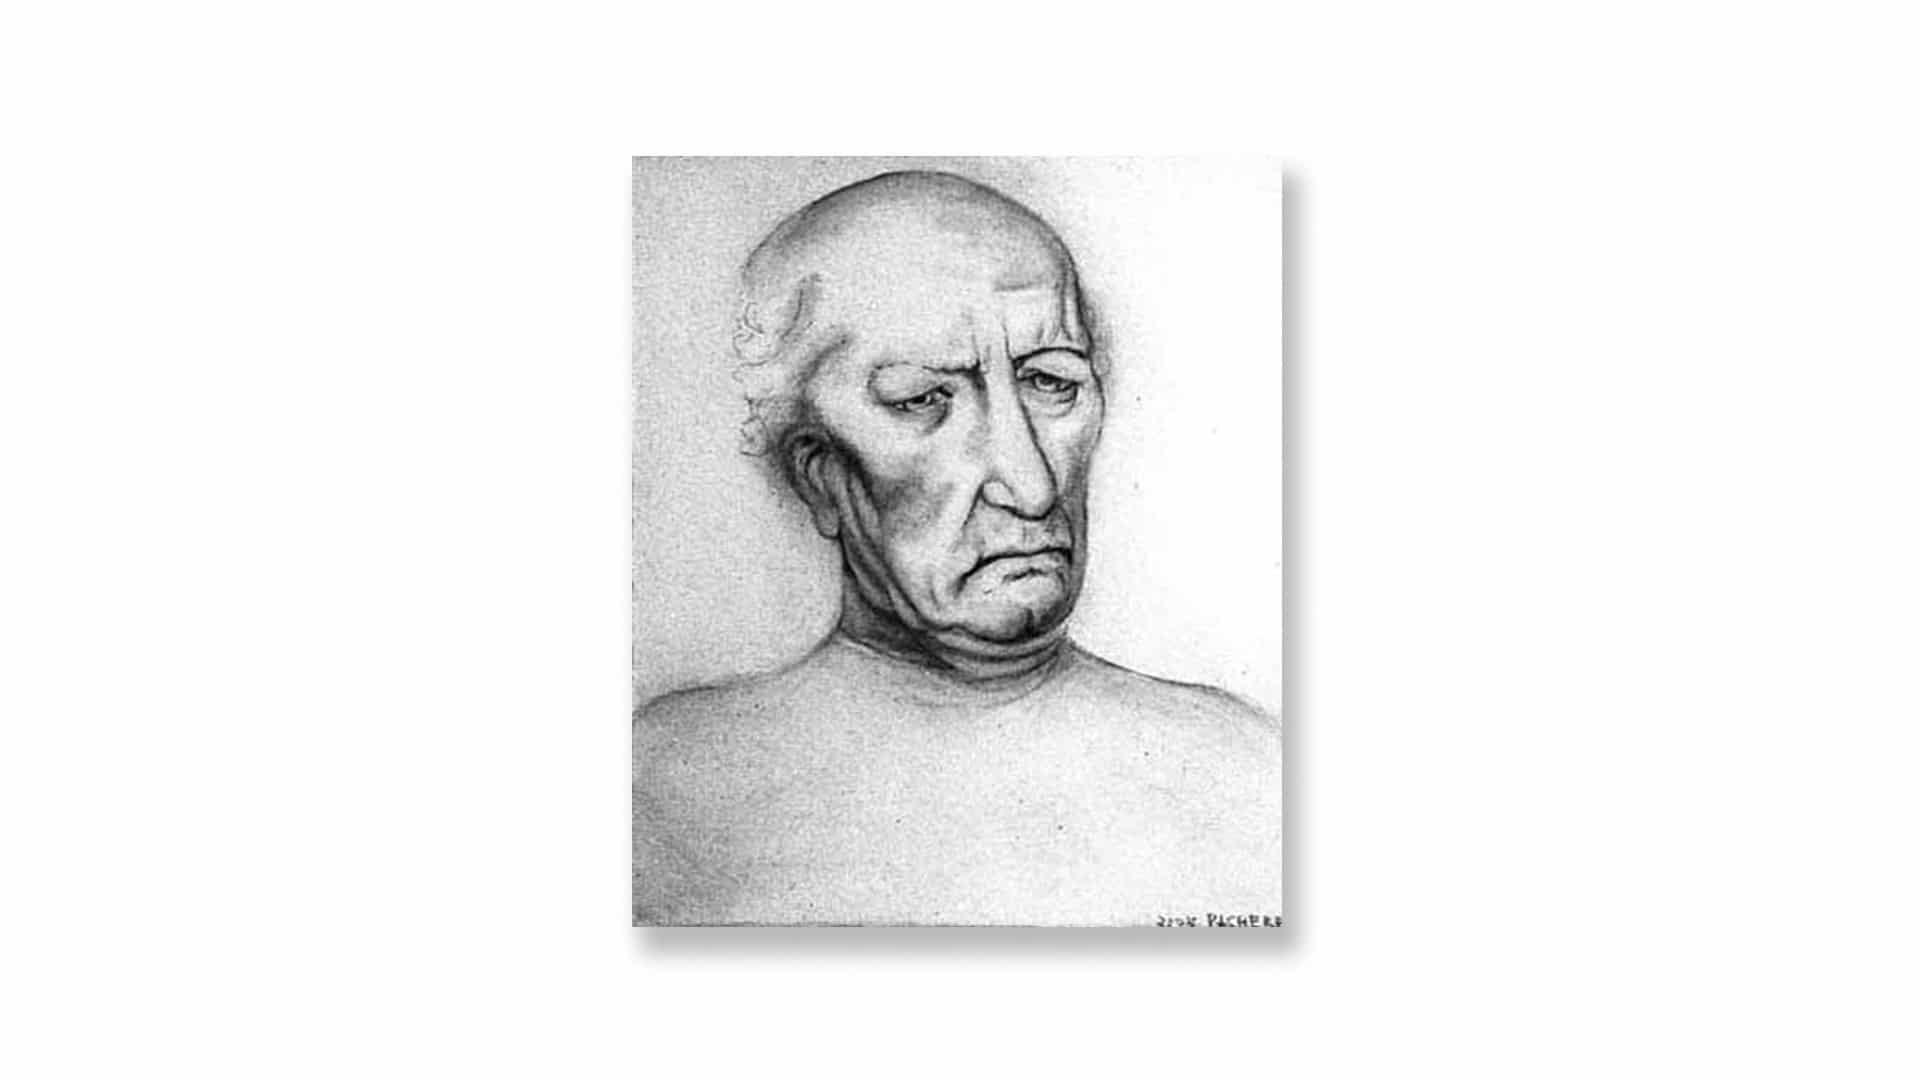 dibujos-galeria-atxeden-pachere-Dibujo-04